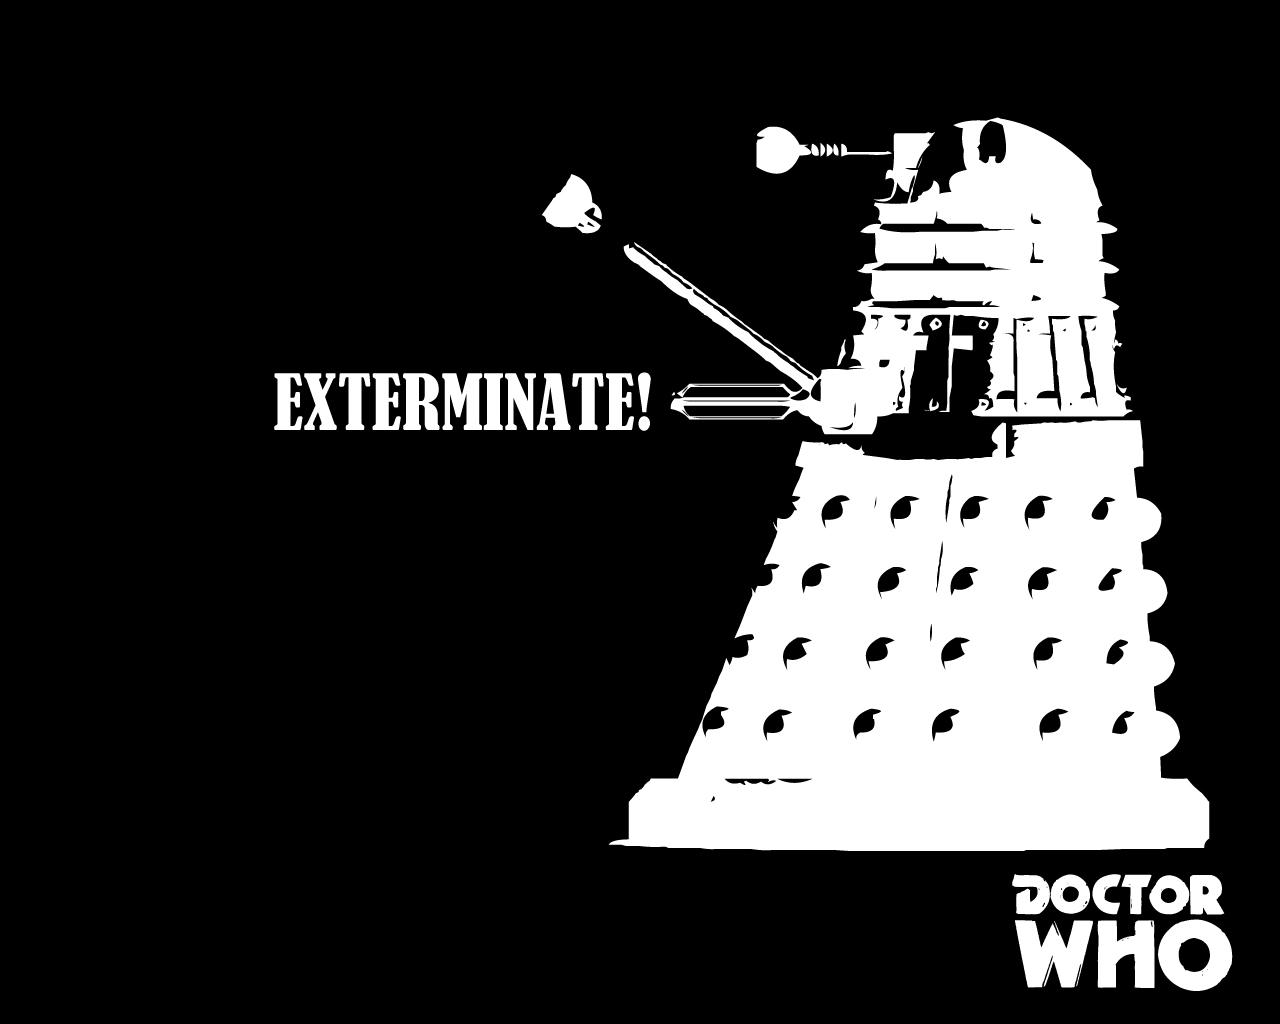 Doctor Who Wallpaper Dalek Exterminate Doctor Who Dalek Wallp...